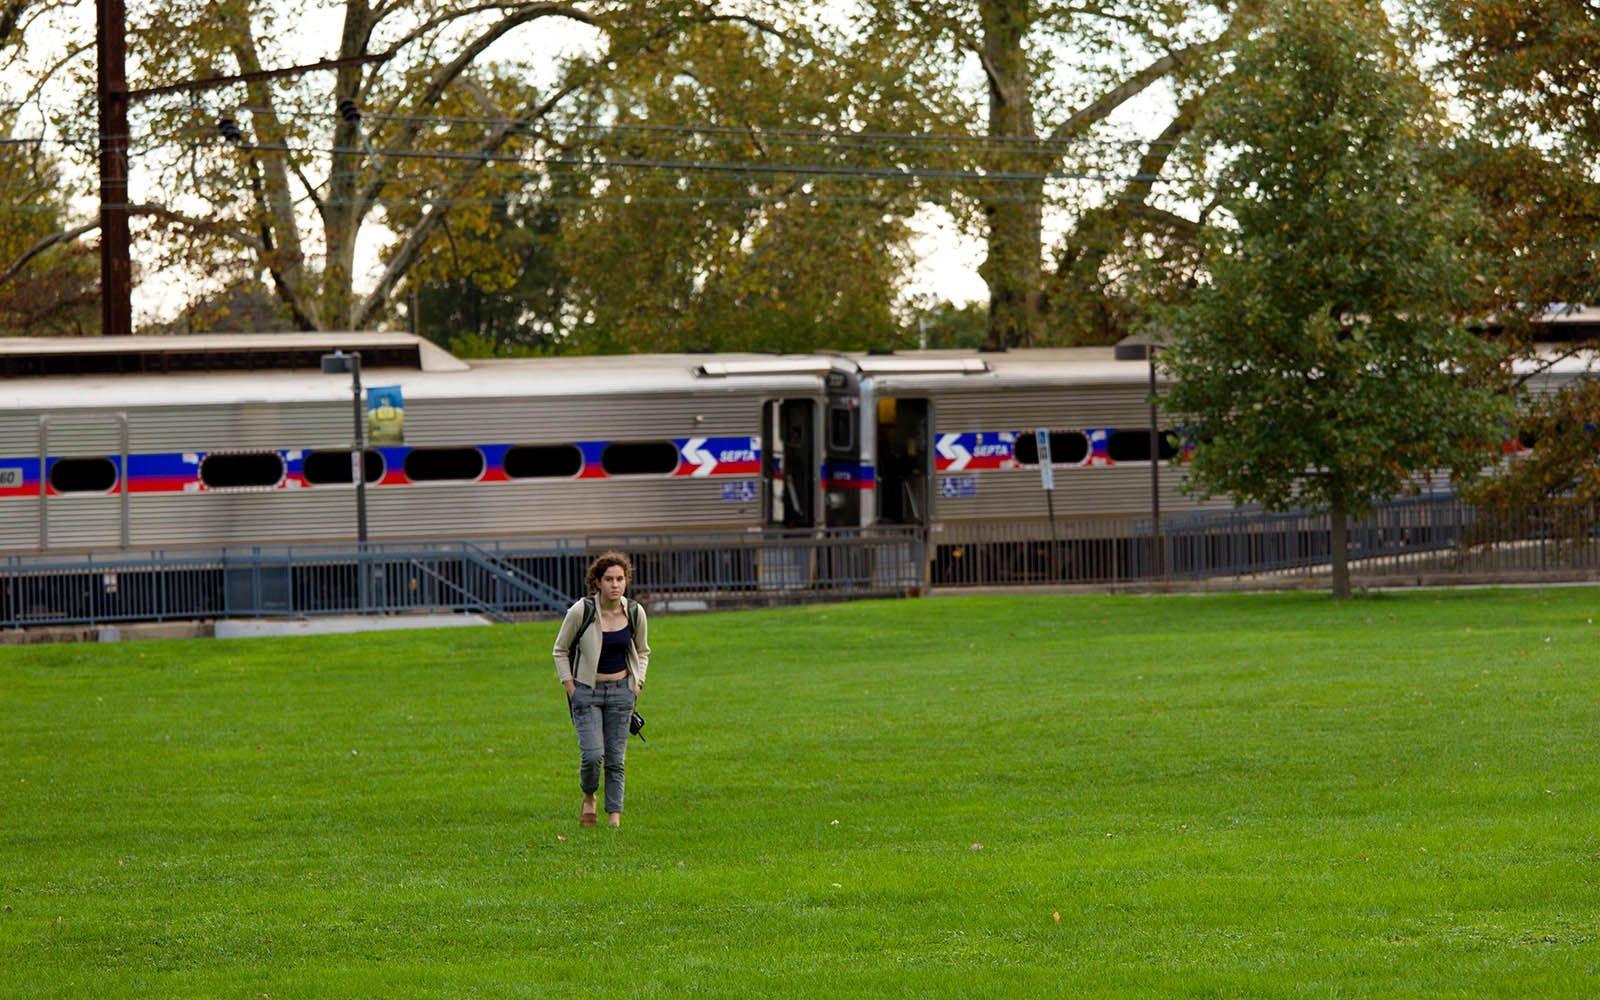 Swarthmore student walks away from departing SEPTA train